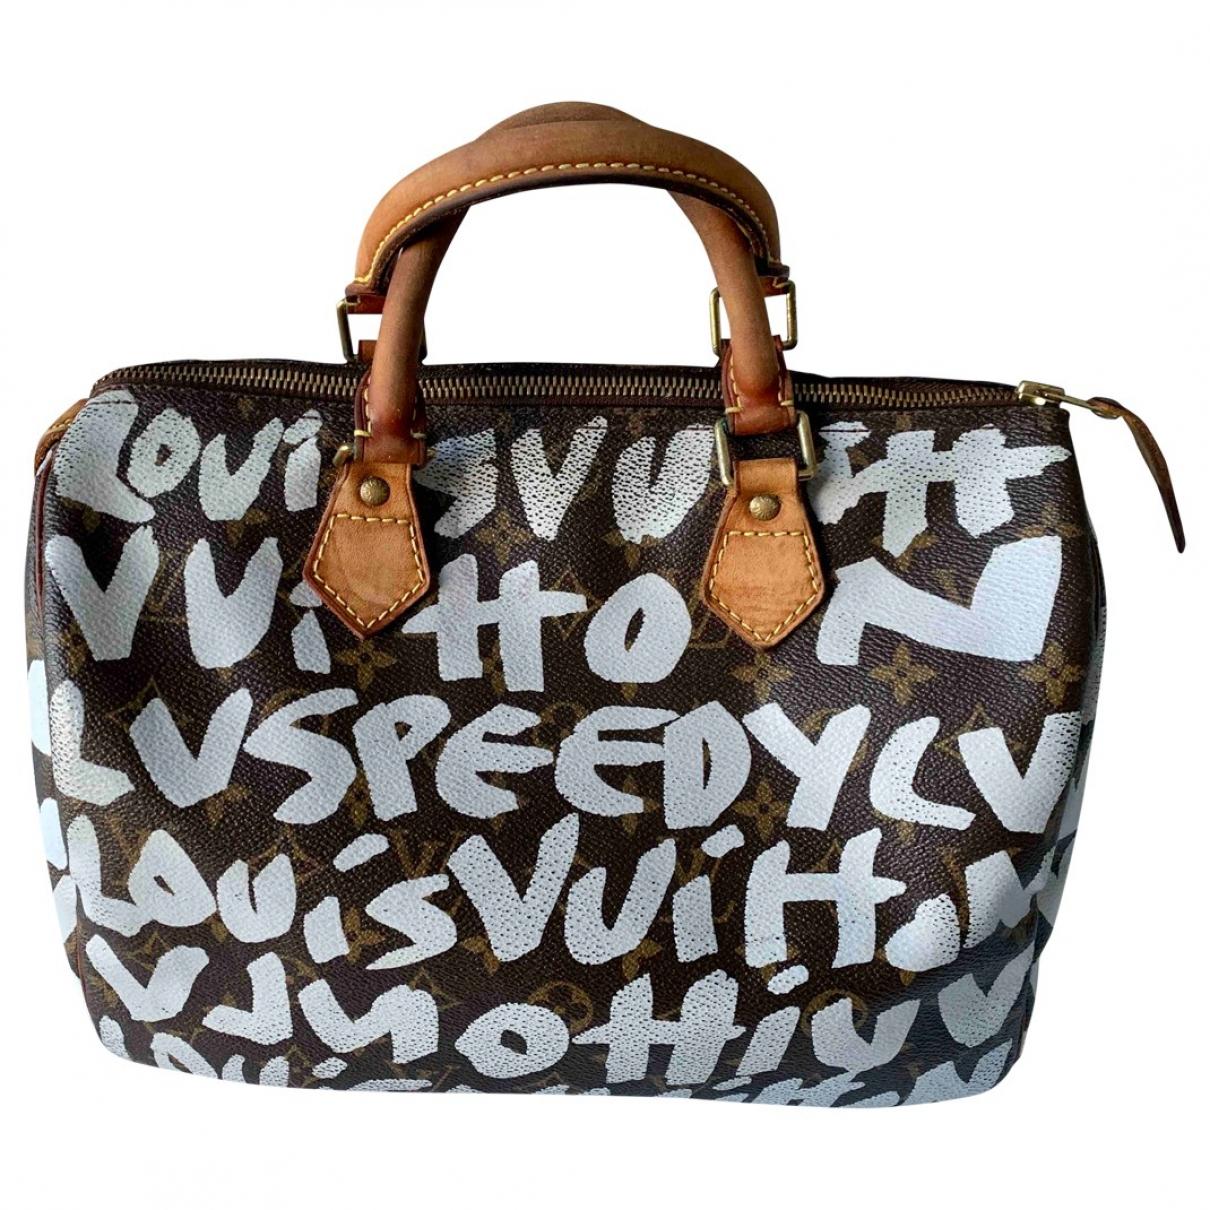 Louis Vuitton - Sac a main Speedy pour femme en toile